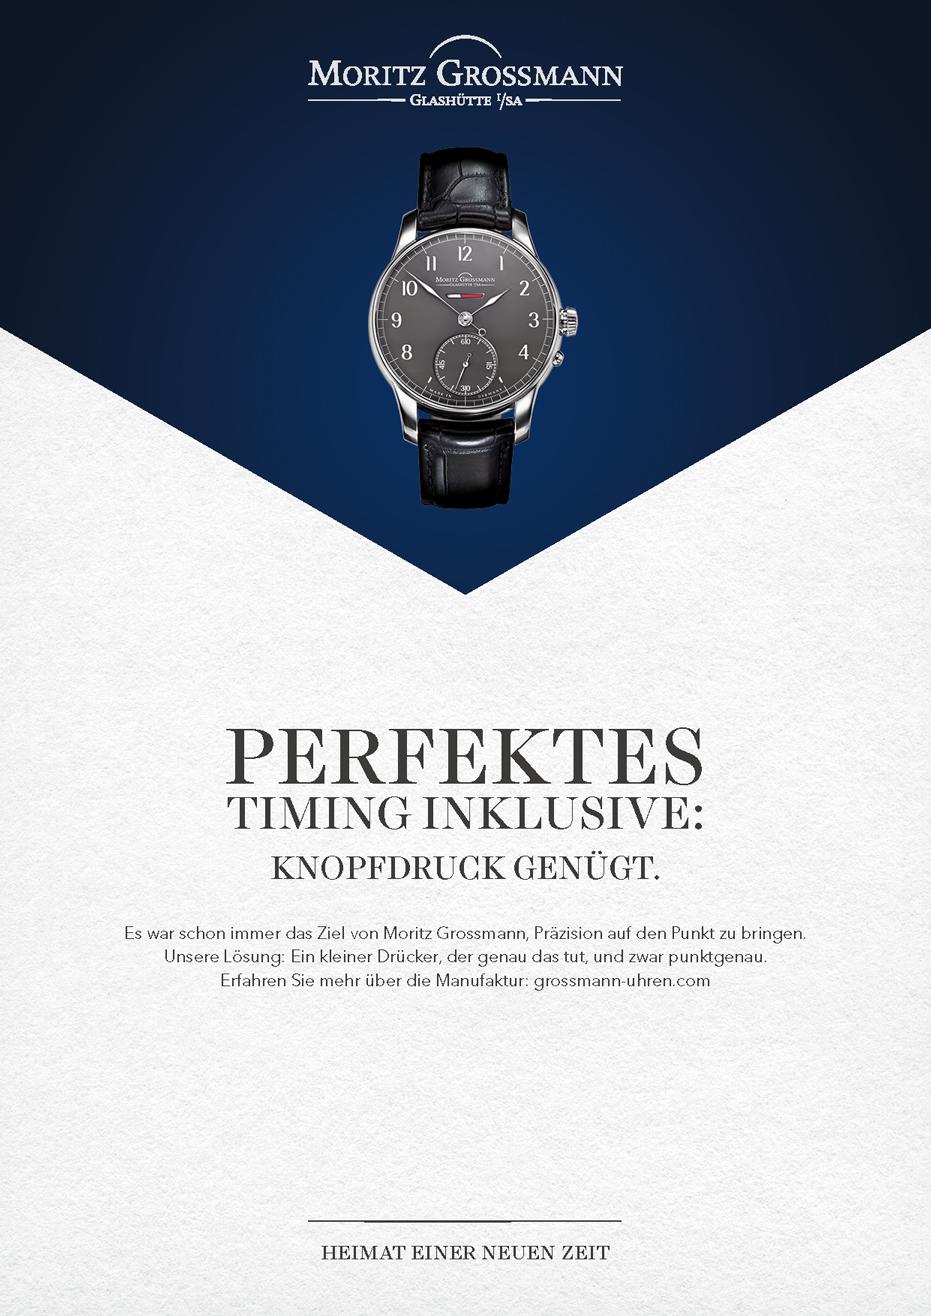 Perfektes Timing inklusive: knopfdruck genügt. - Motiv 6